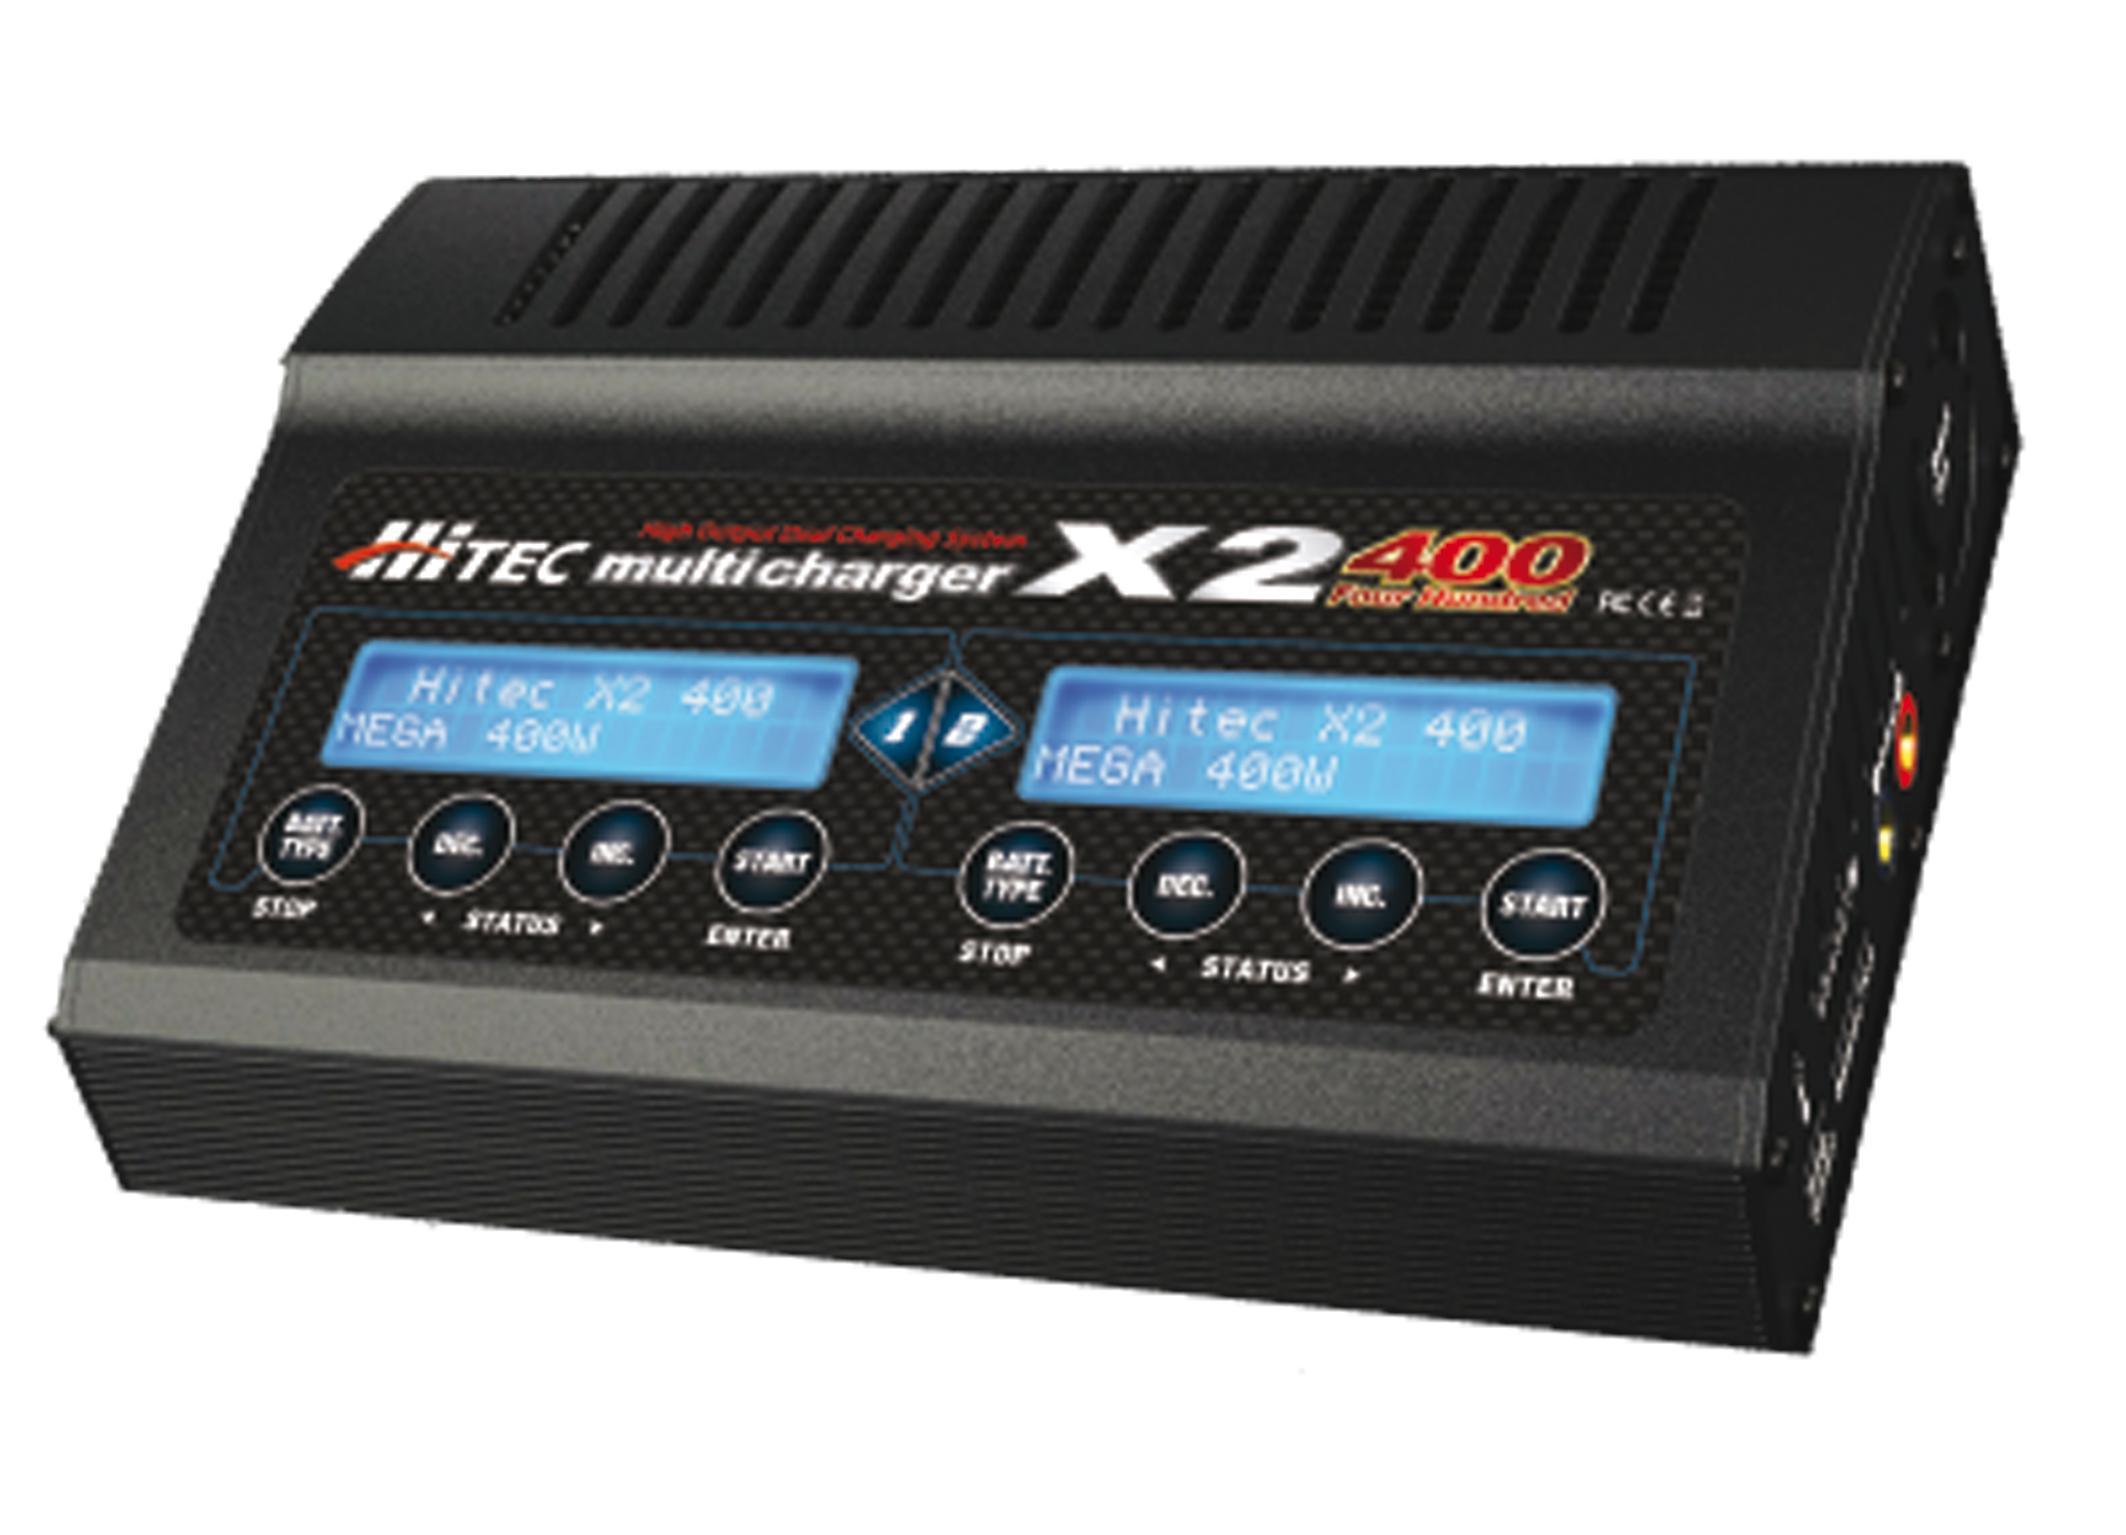 HiTEC Multicharger X2 400